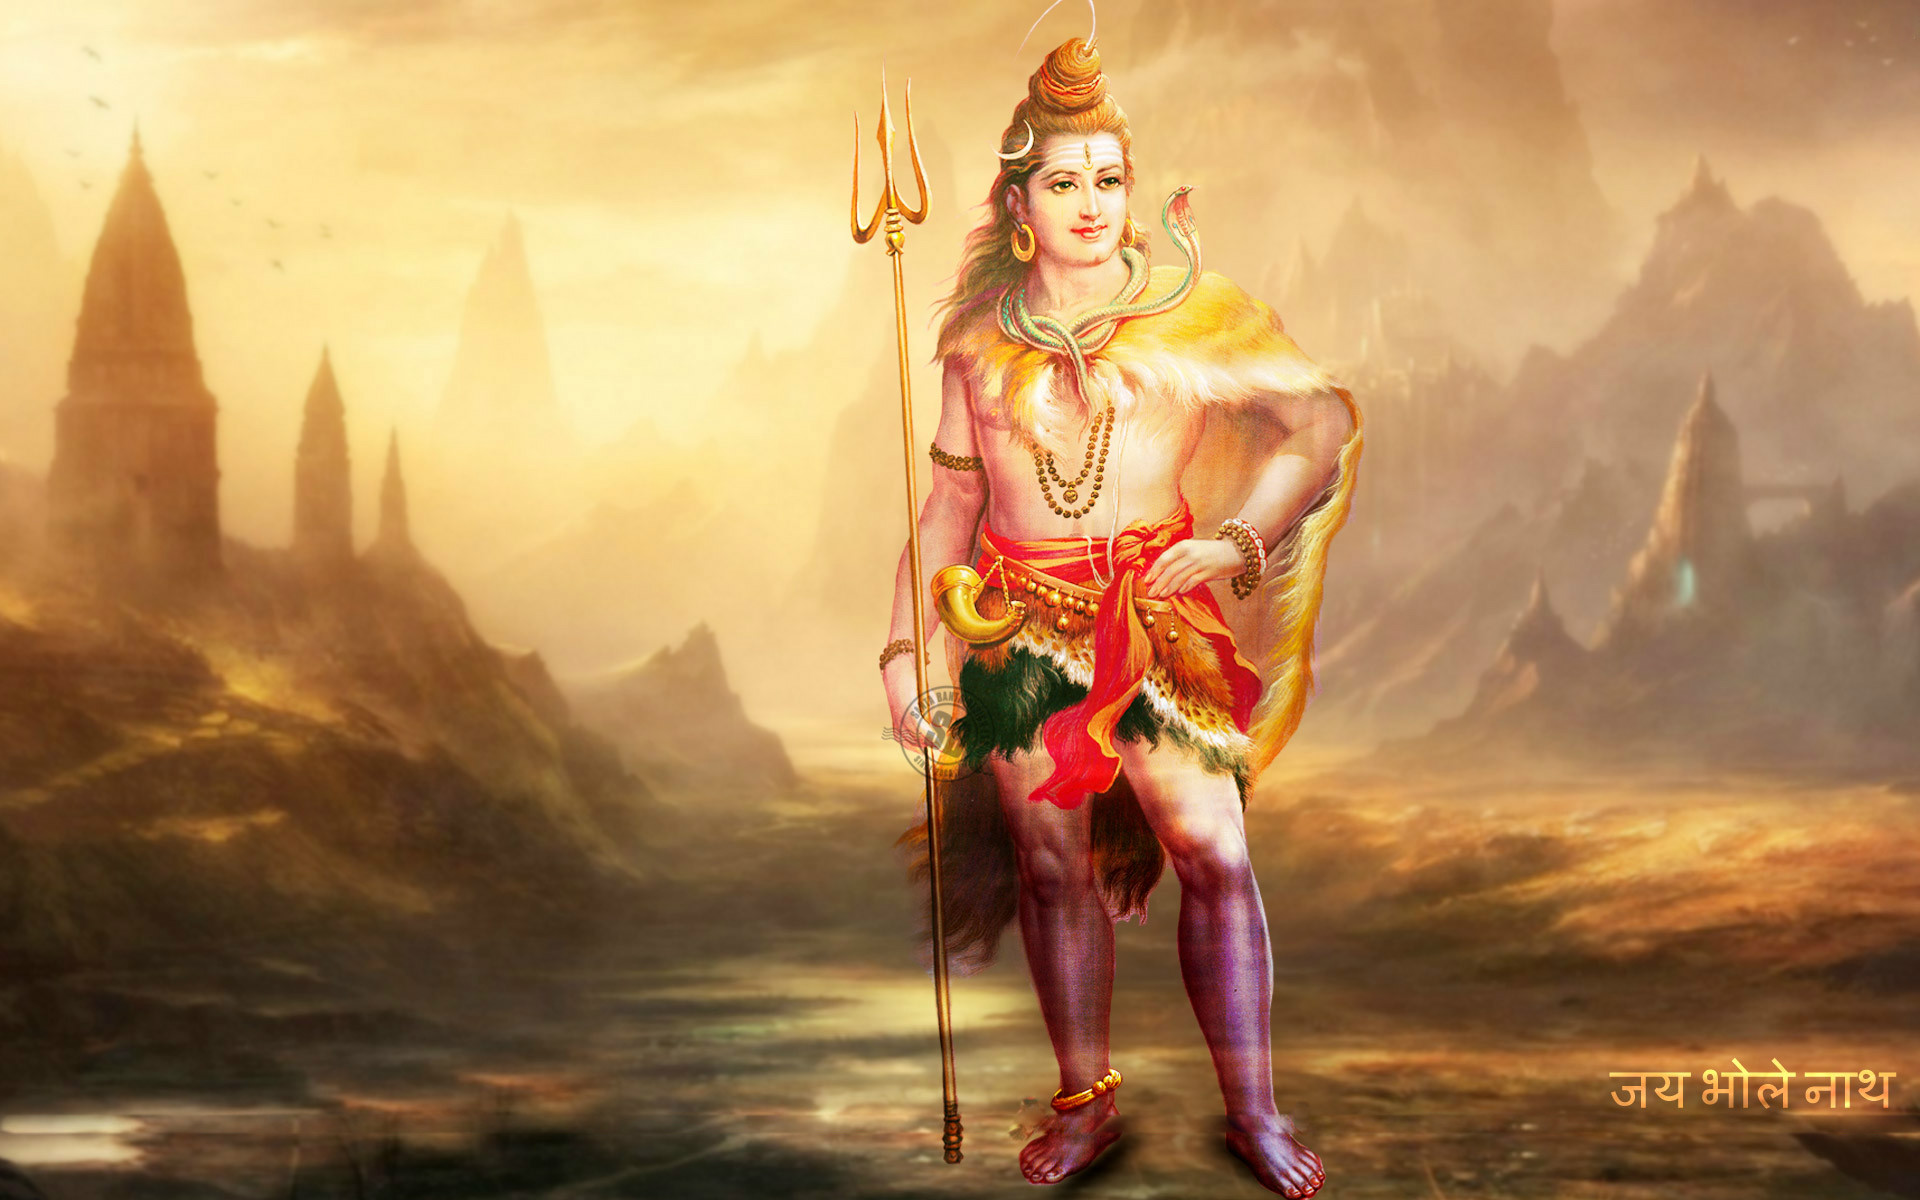 18 SHAKTI PEETAS : Shakti Peethas Artistic pictures of lord shiva